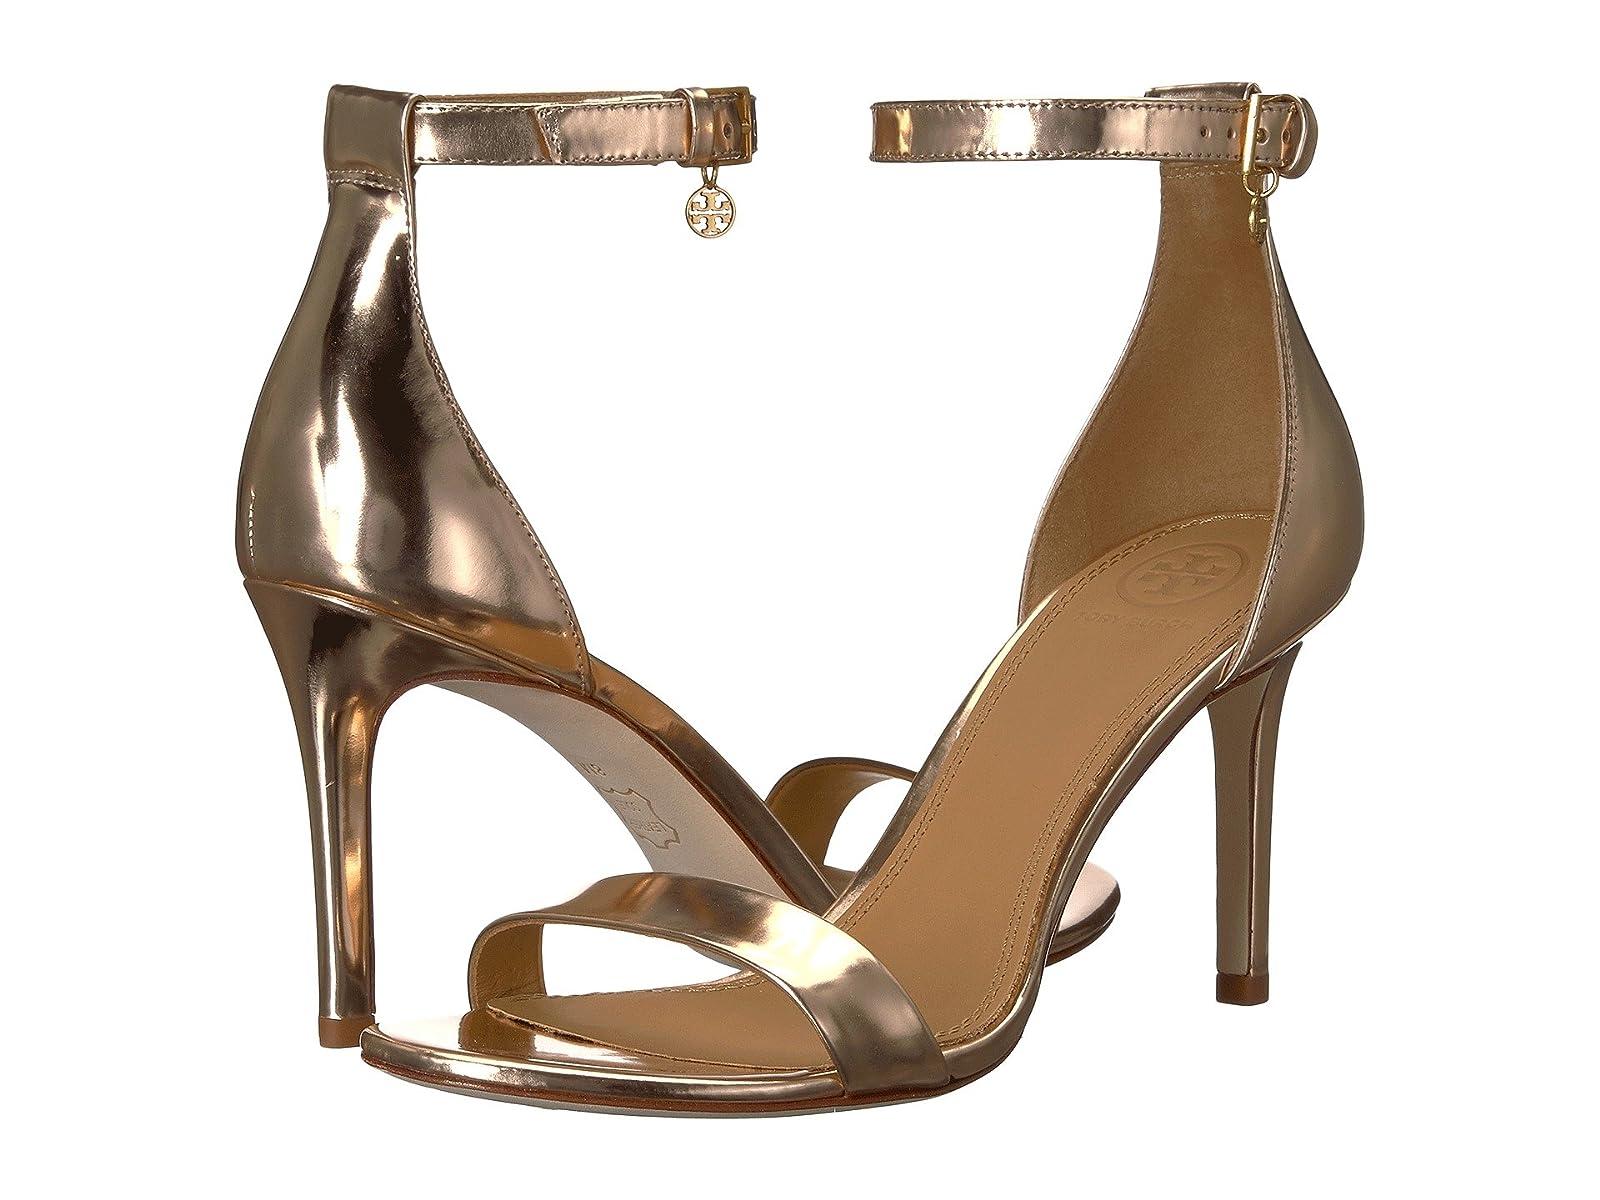 Tory Burch Ellie 85mm Ankle-Strap SandalAtmospheric grades have affordable shoes